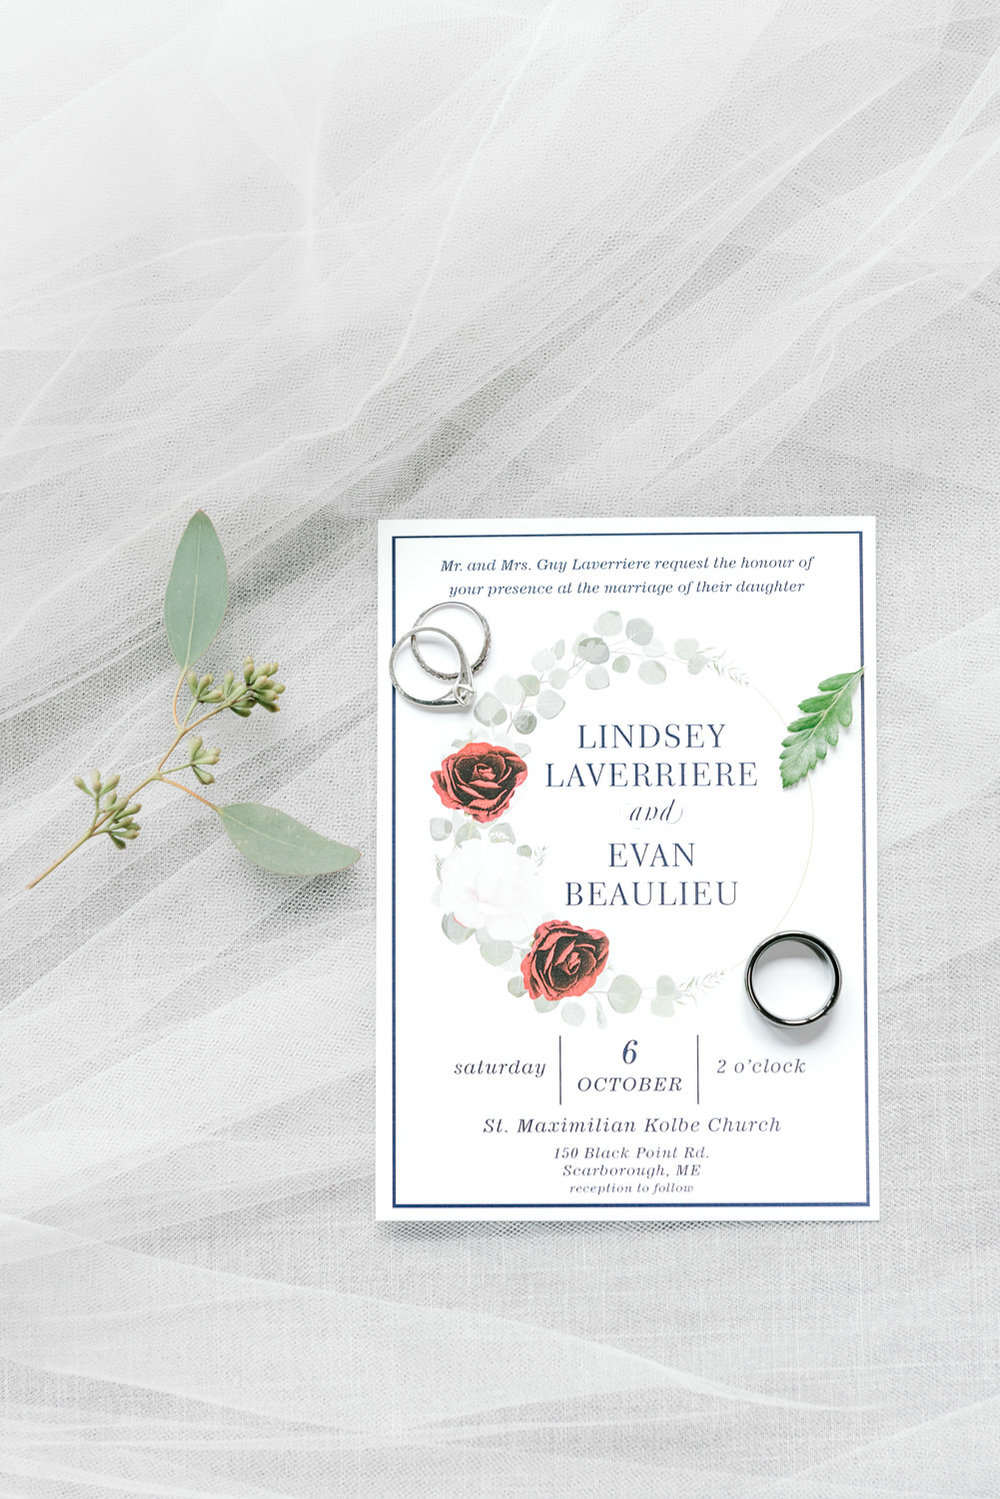 St. Maximilian Kolbe Parish Scarborough Wedding Invitation